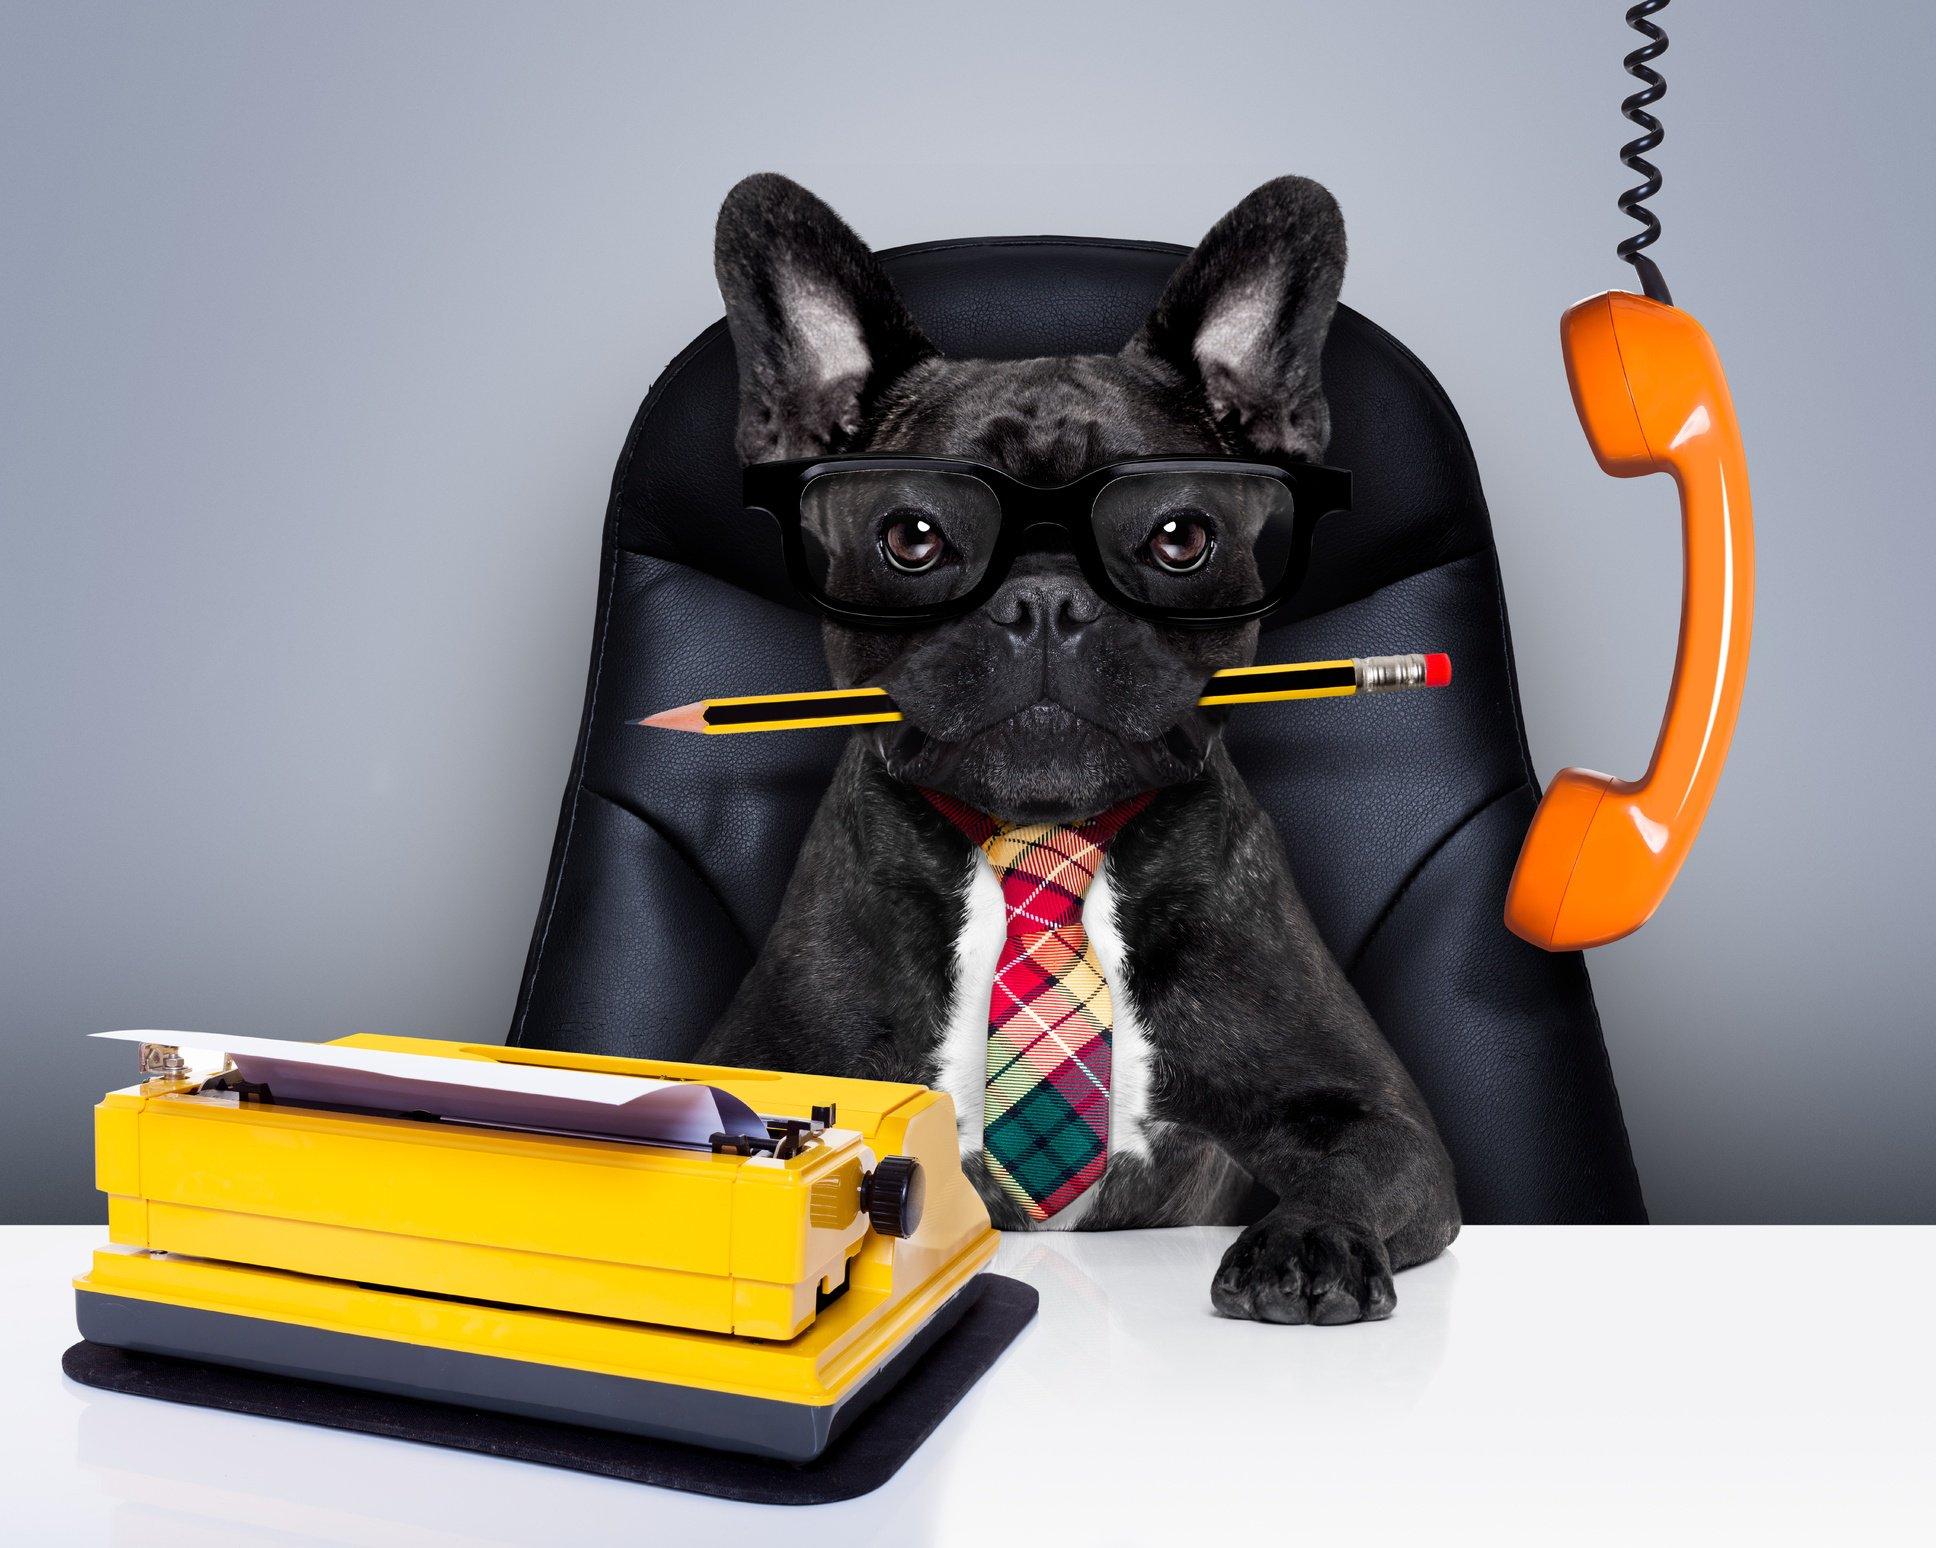 Dog dressed as boss